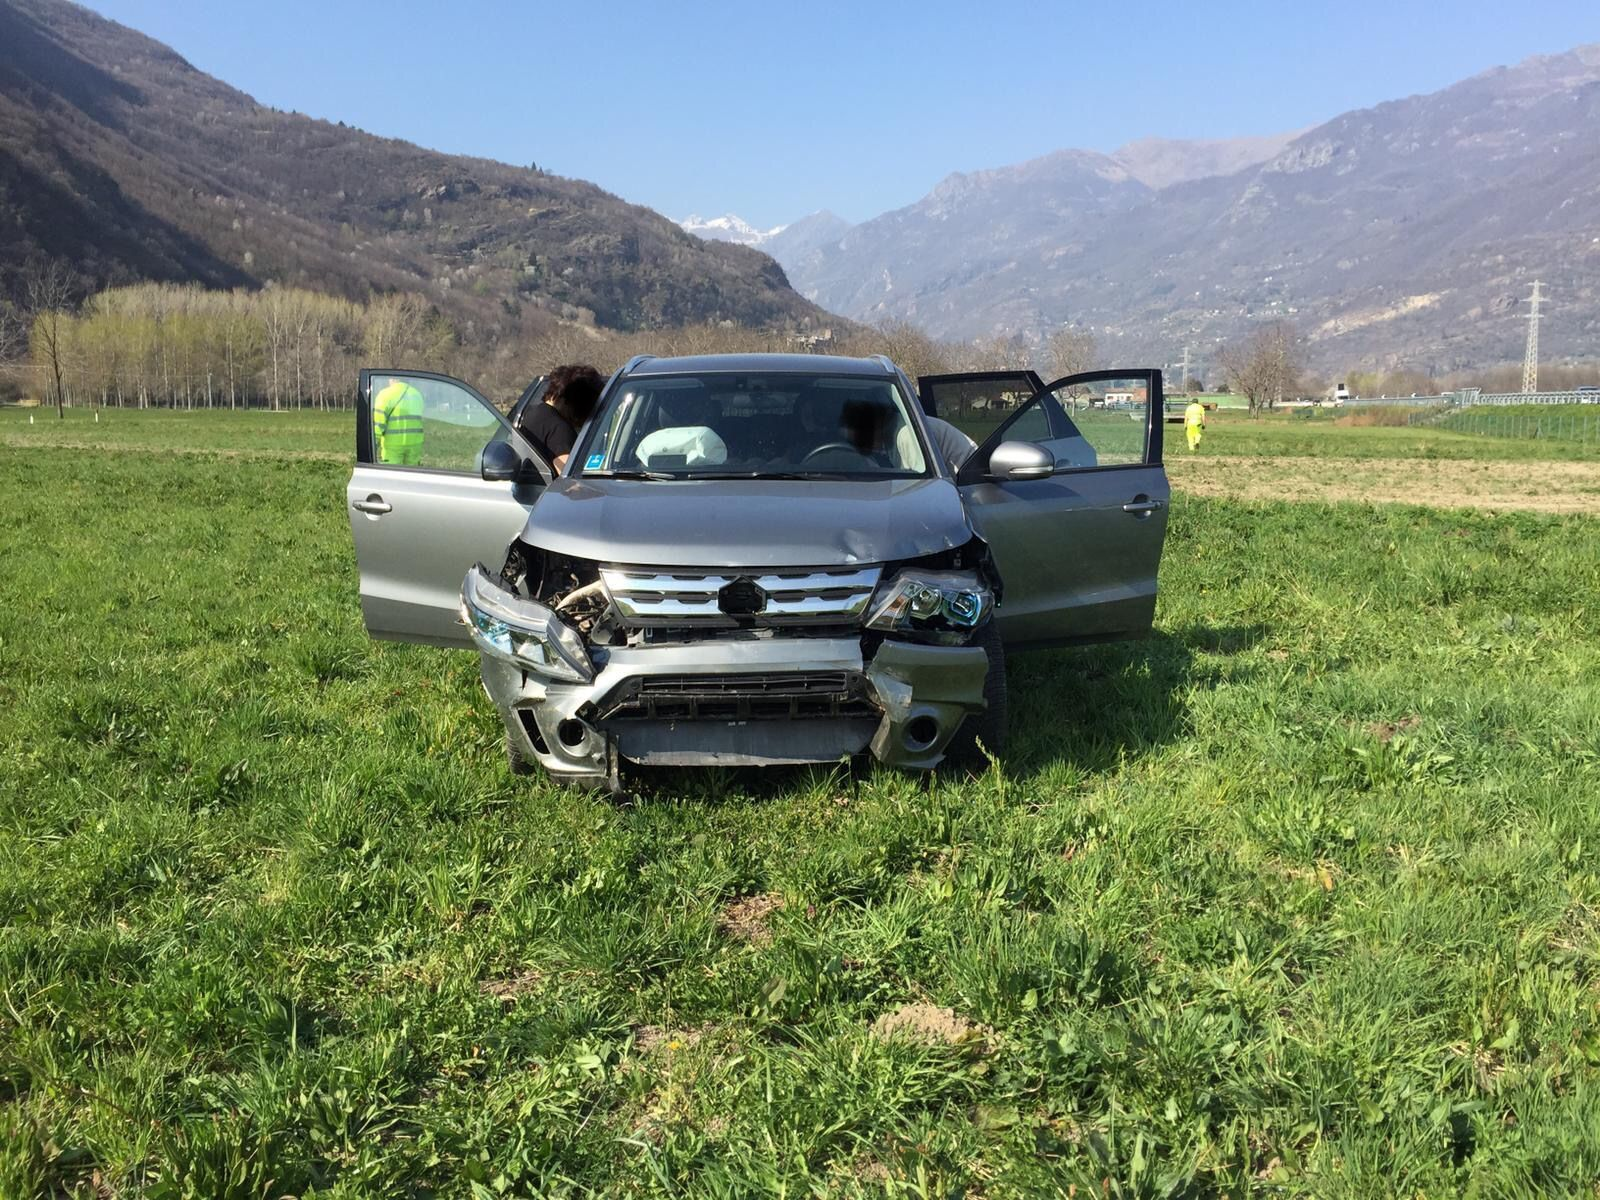 AUTOSTRADA A5 - Incidente stradale, auto finisce nei campi - FOTO